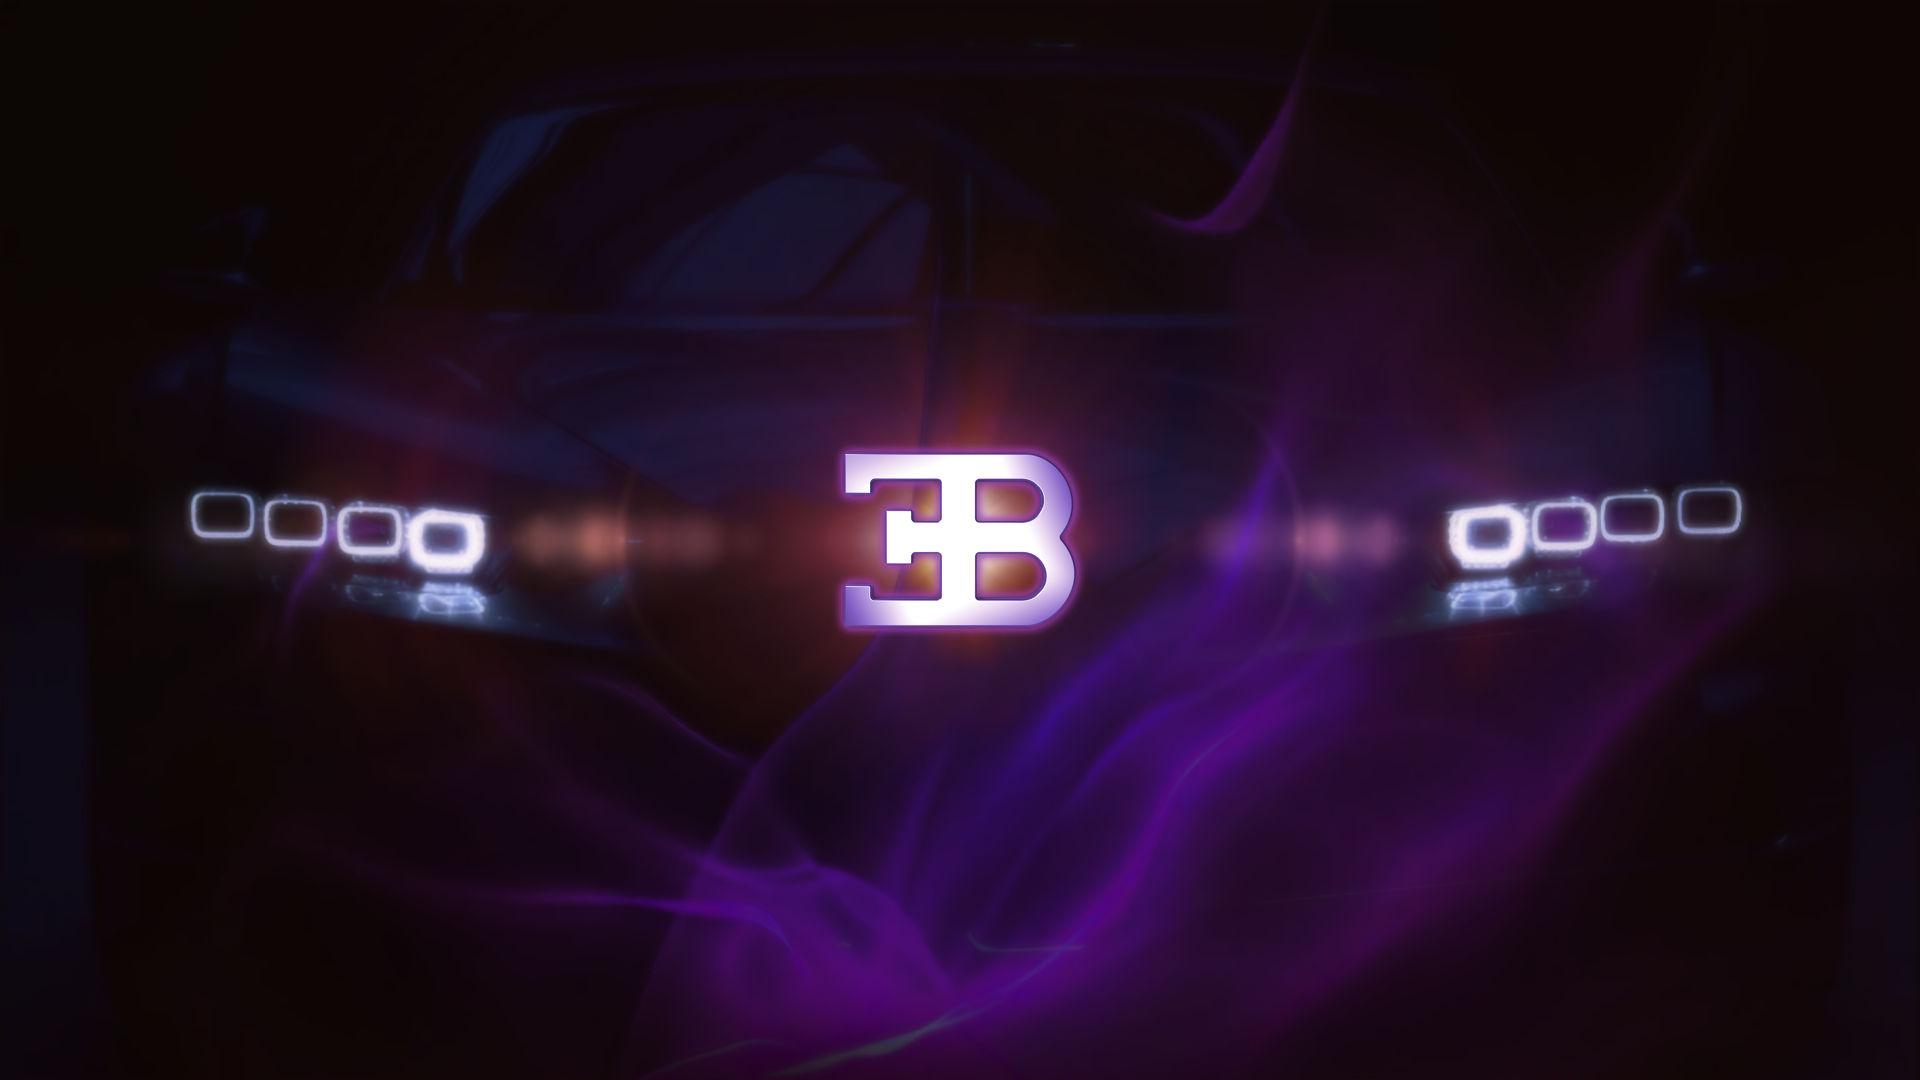 Black Bugatti Wallpaper Hd